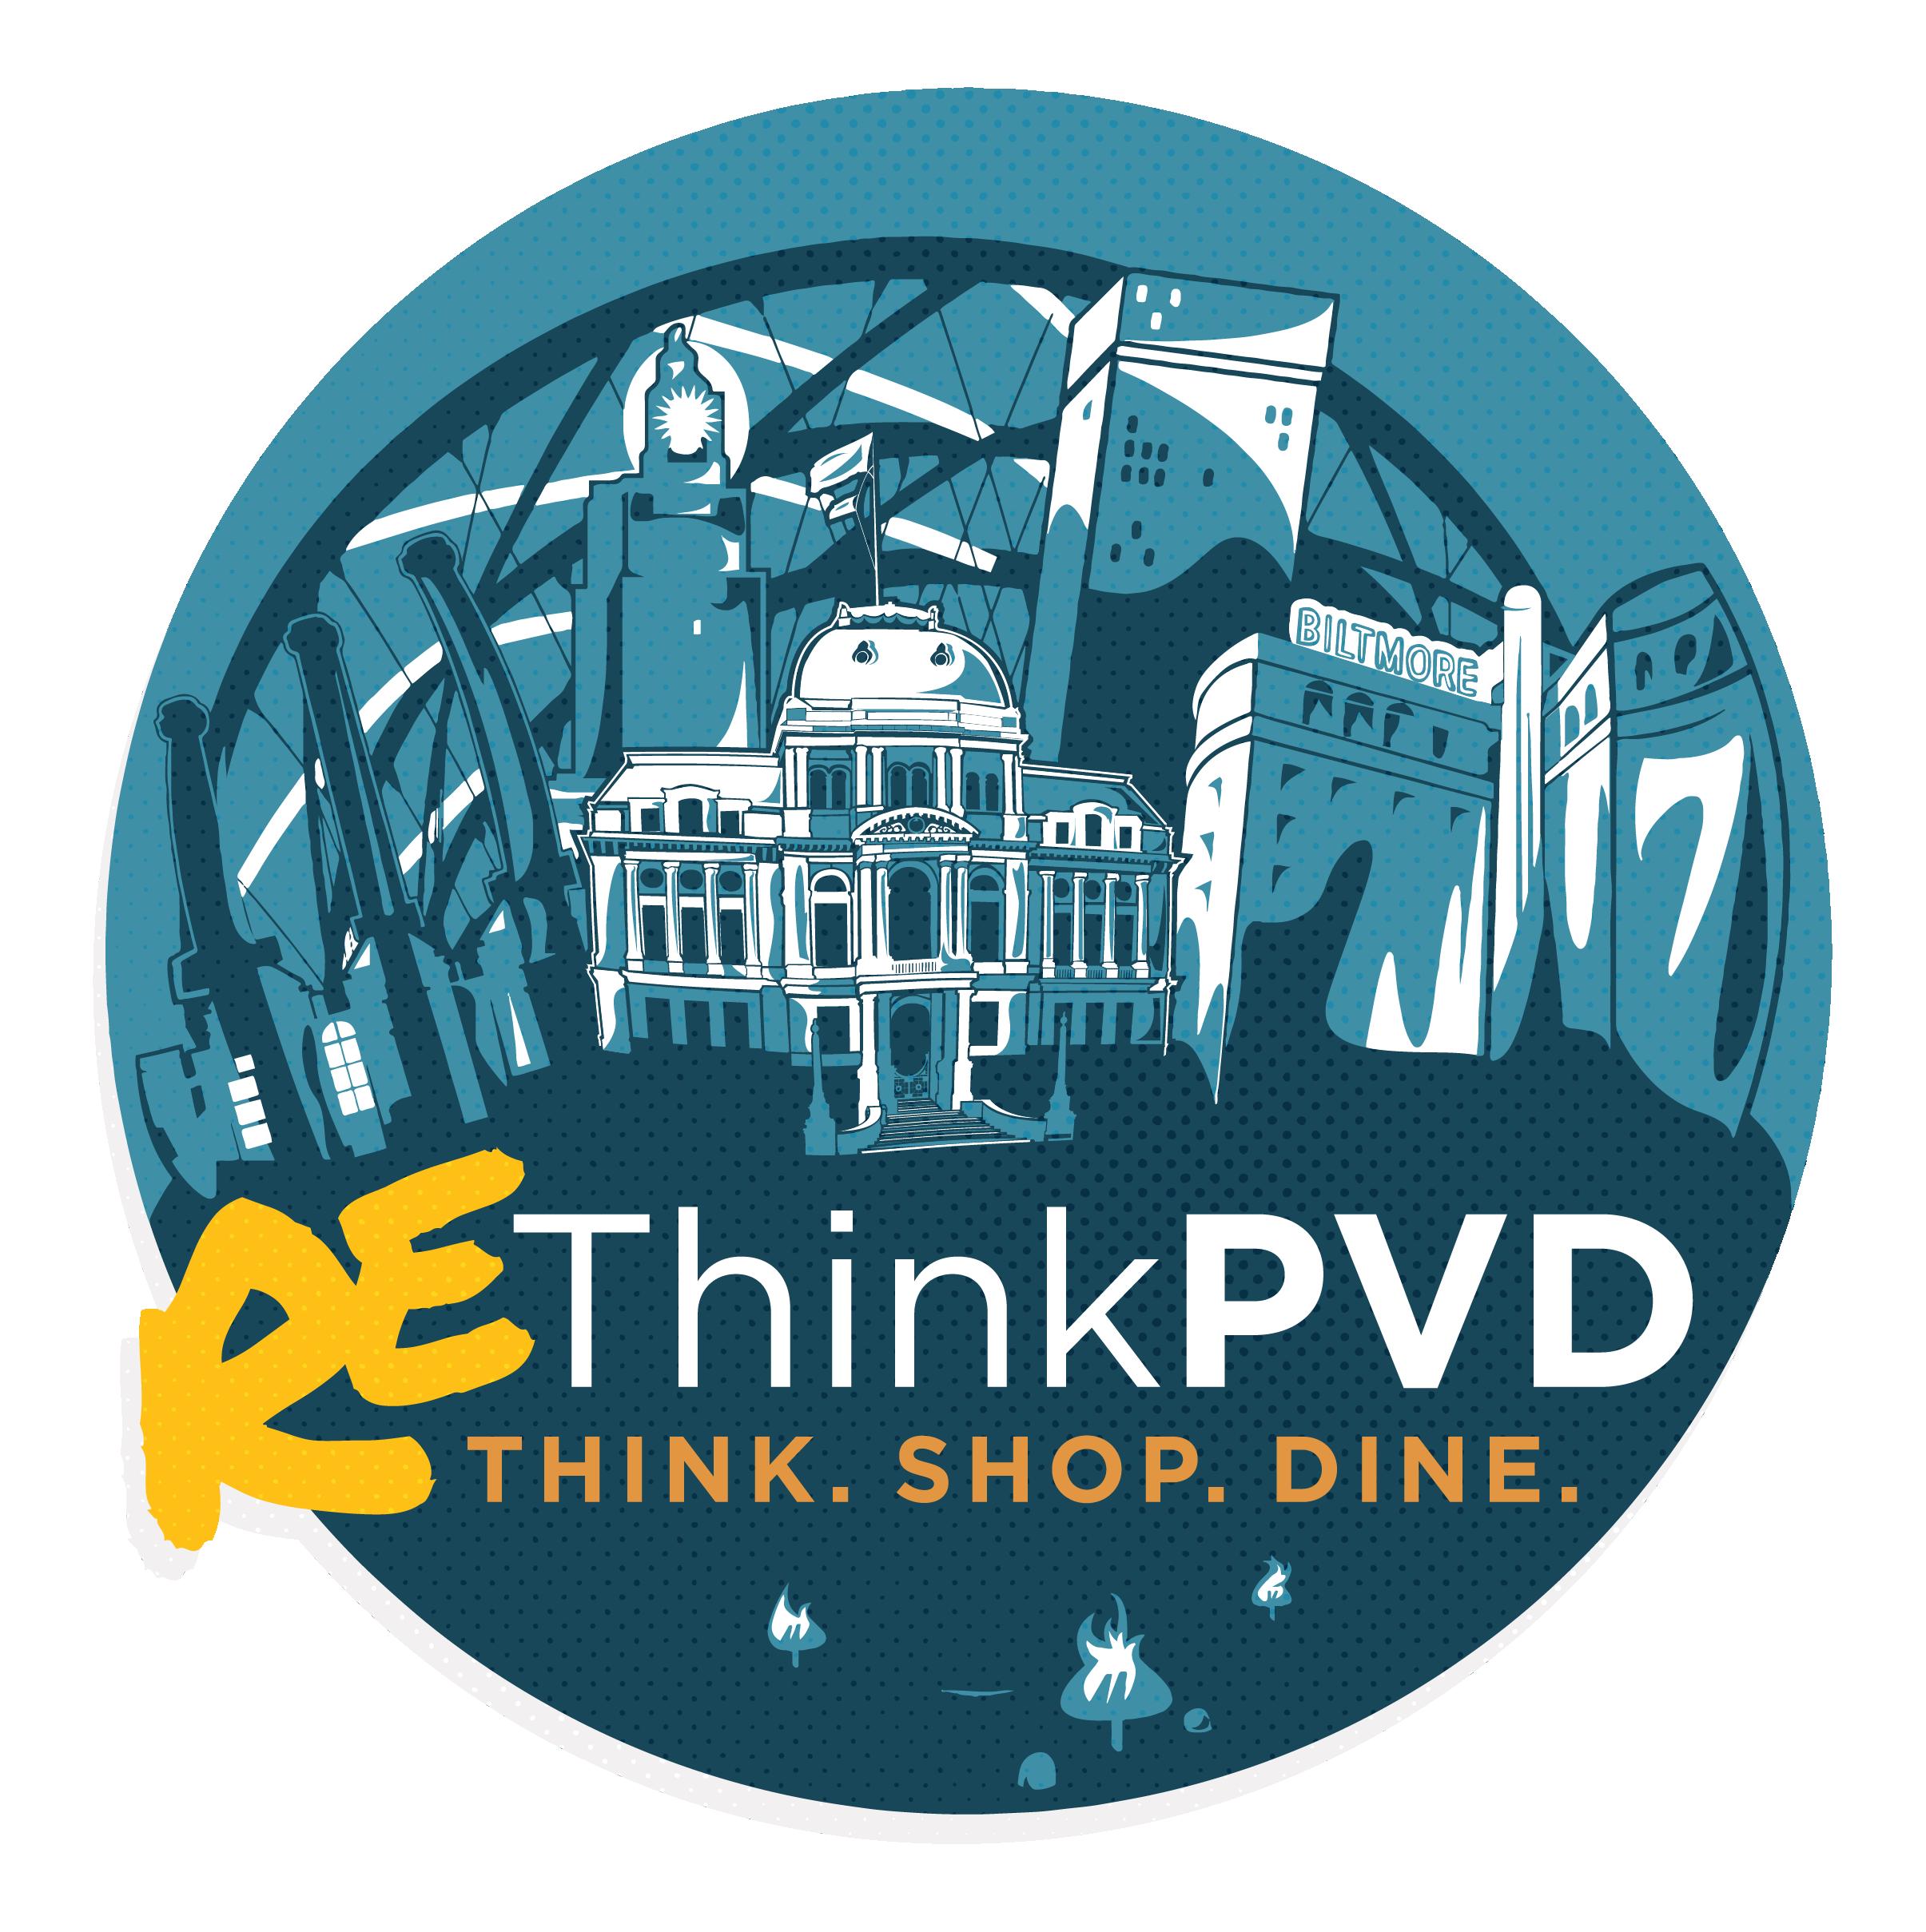 ThinkPVD